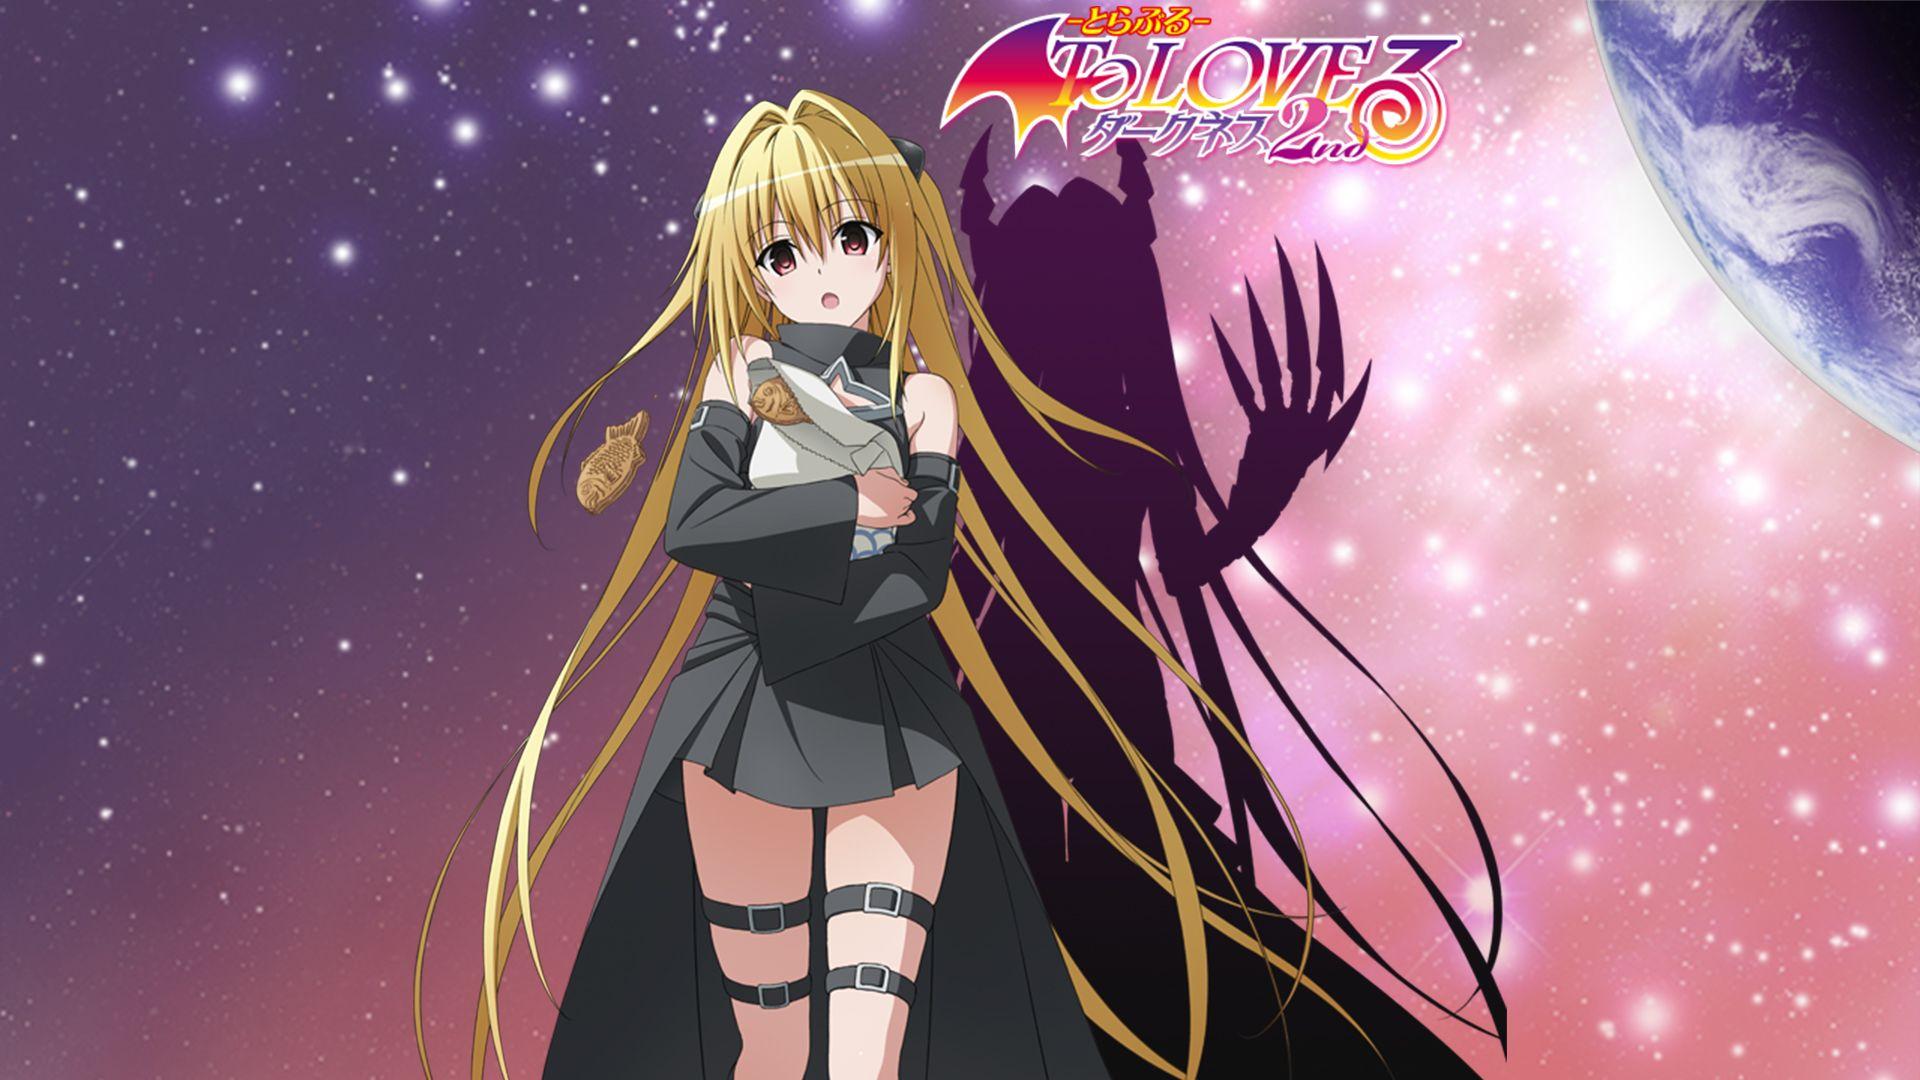 Darkness Wallpaper Hd Anime To Love Ru Darkness 2 1785879